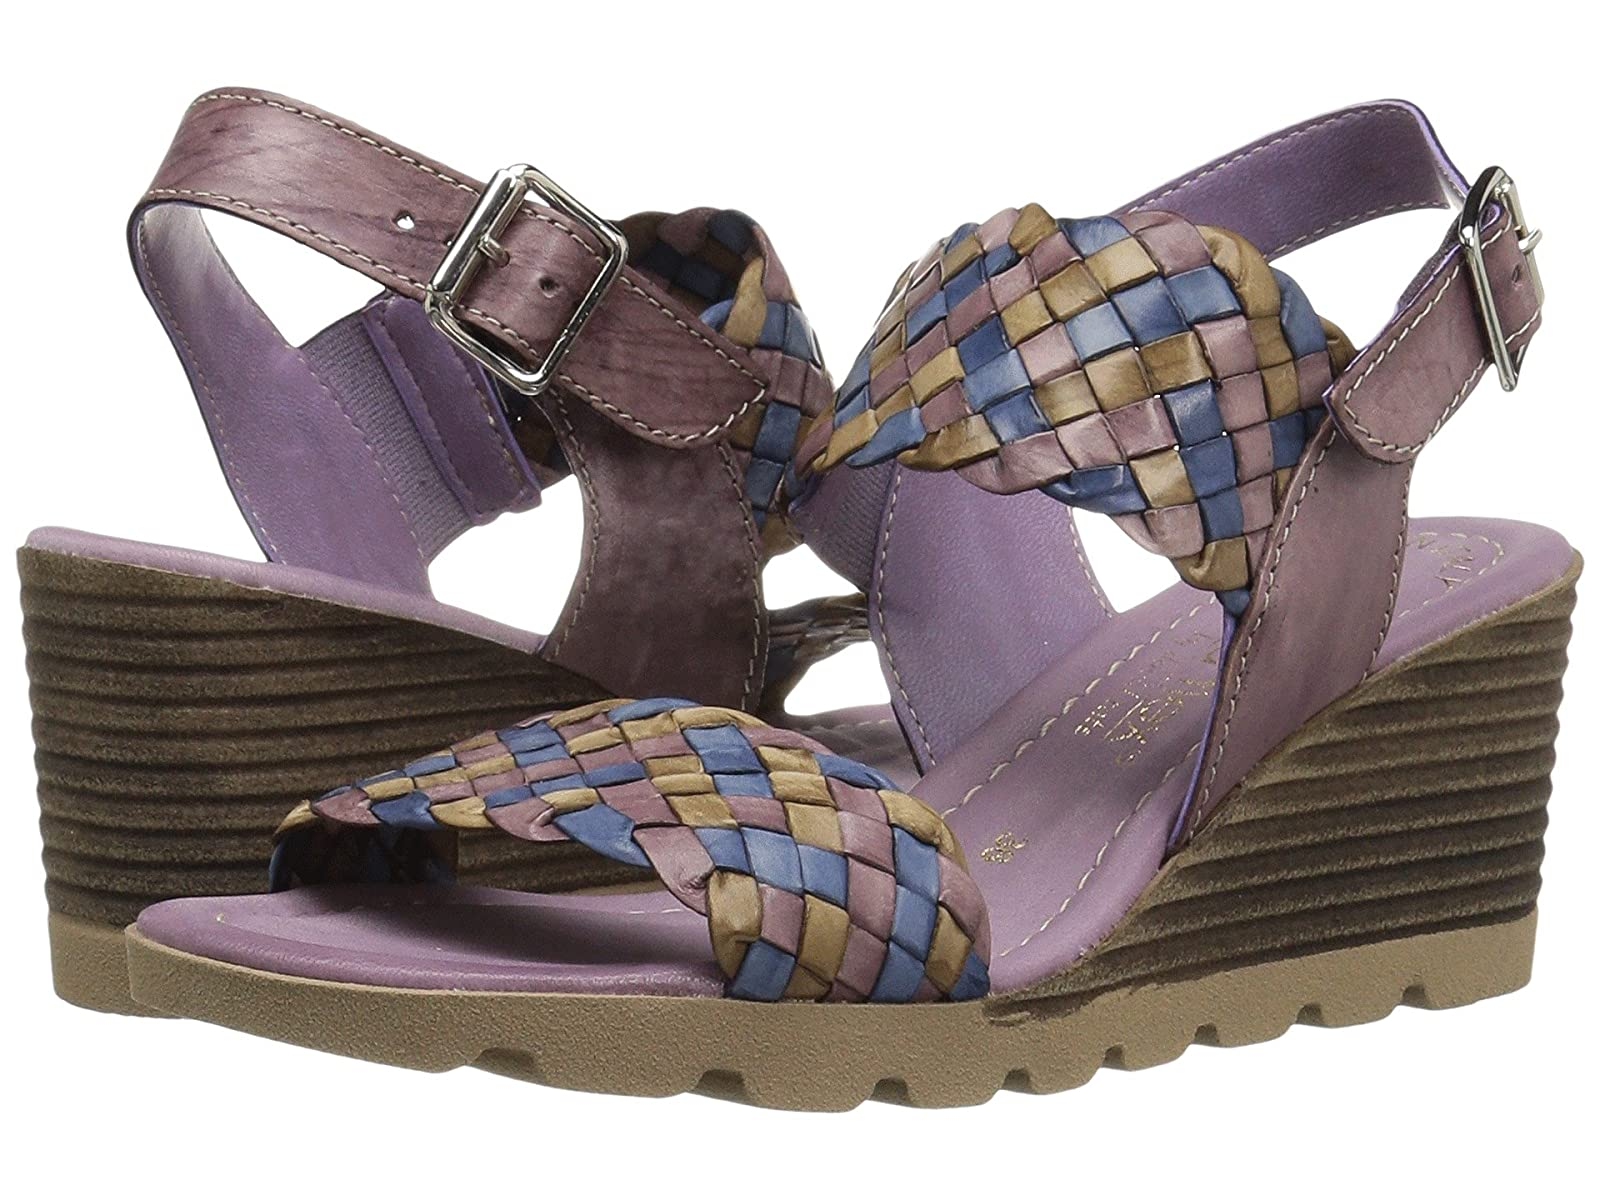 David Tate CoolCheap and distinctive eye-catching shoes